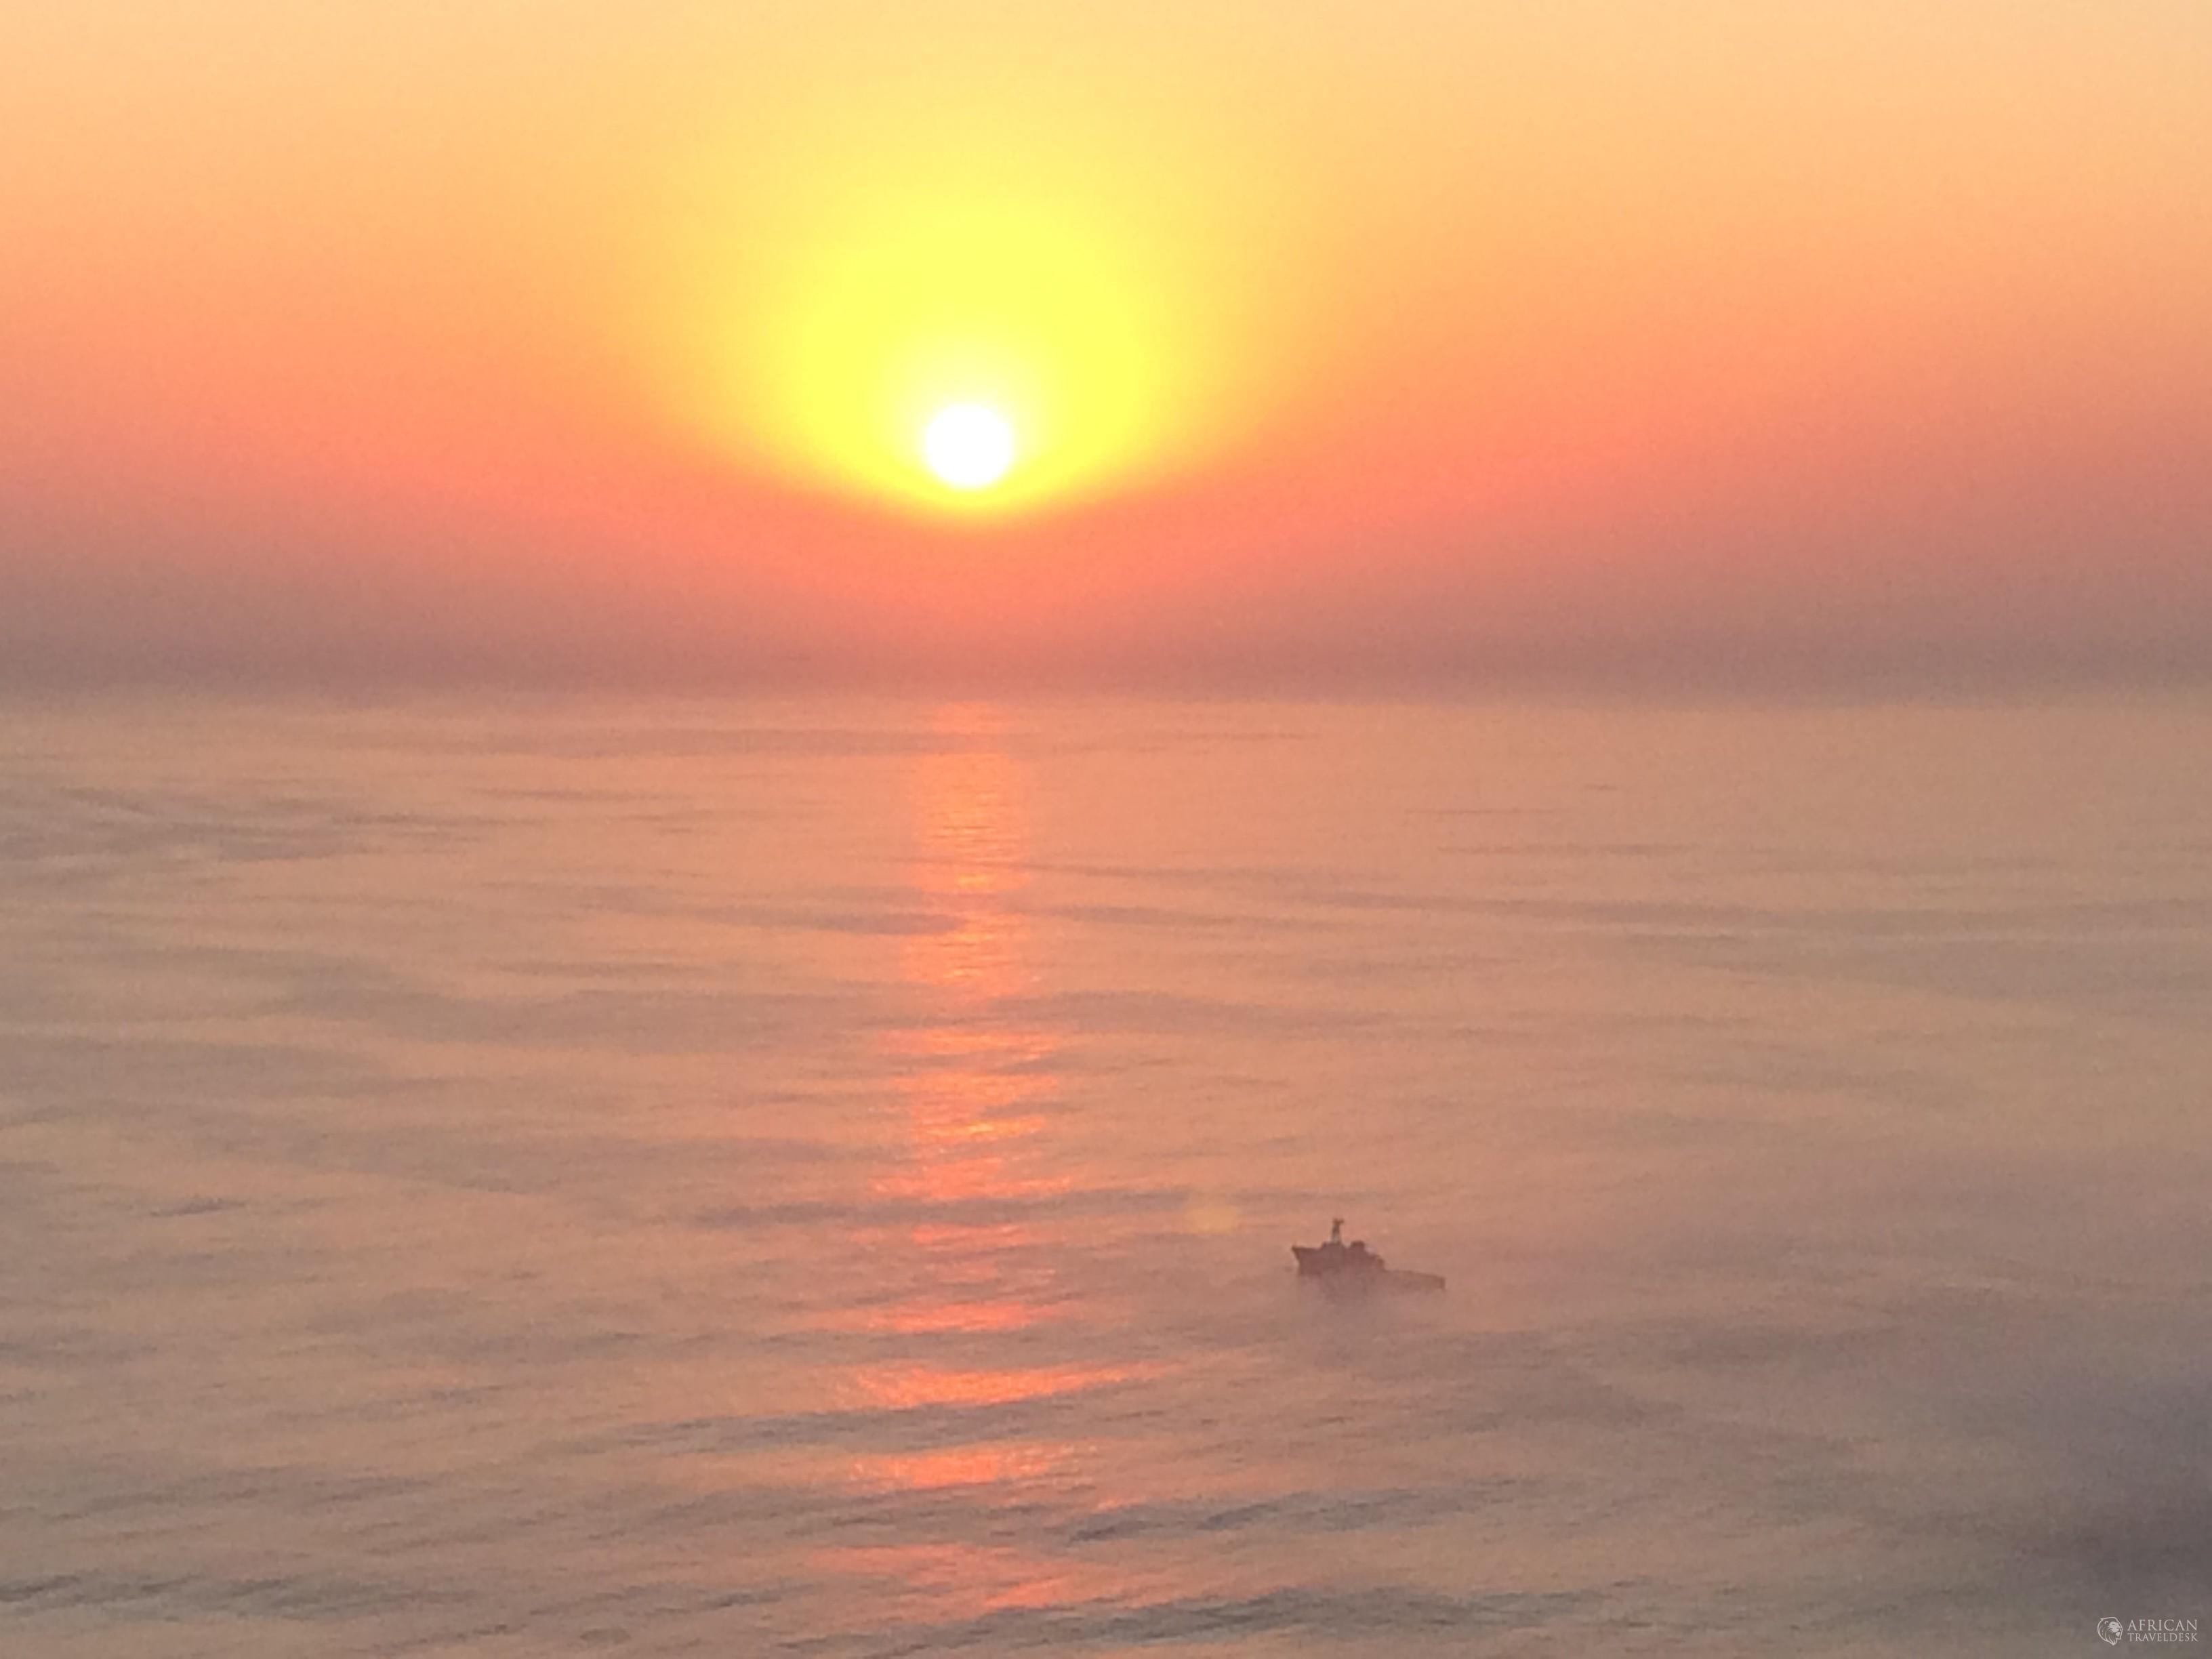 sun-signal-hill-ship-ocean